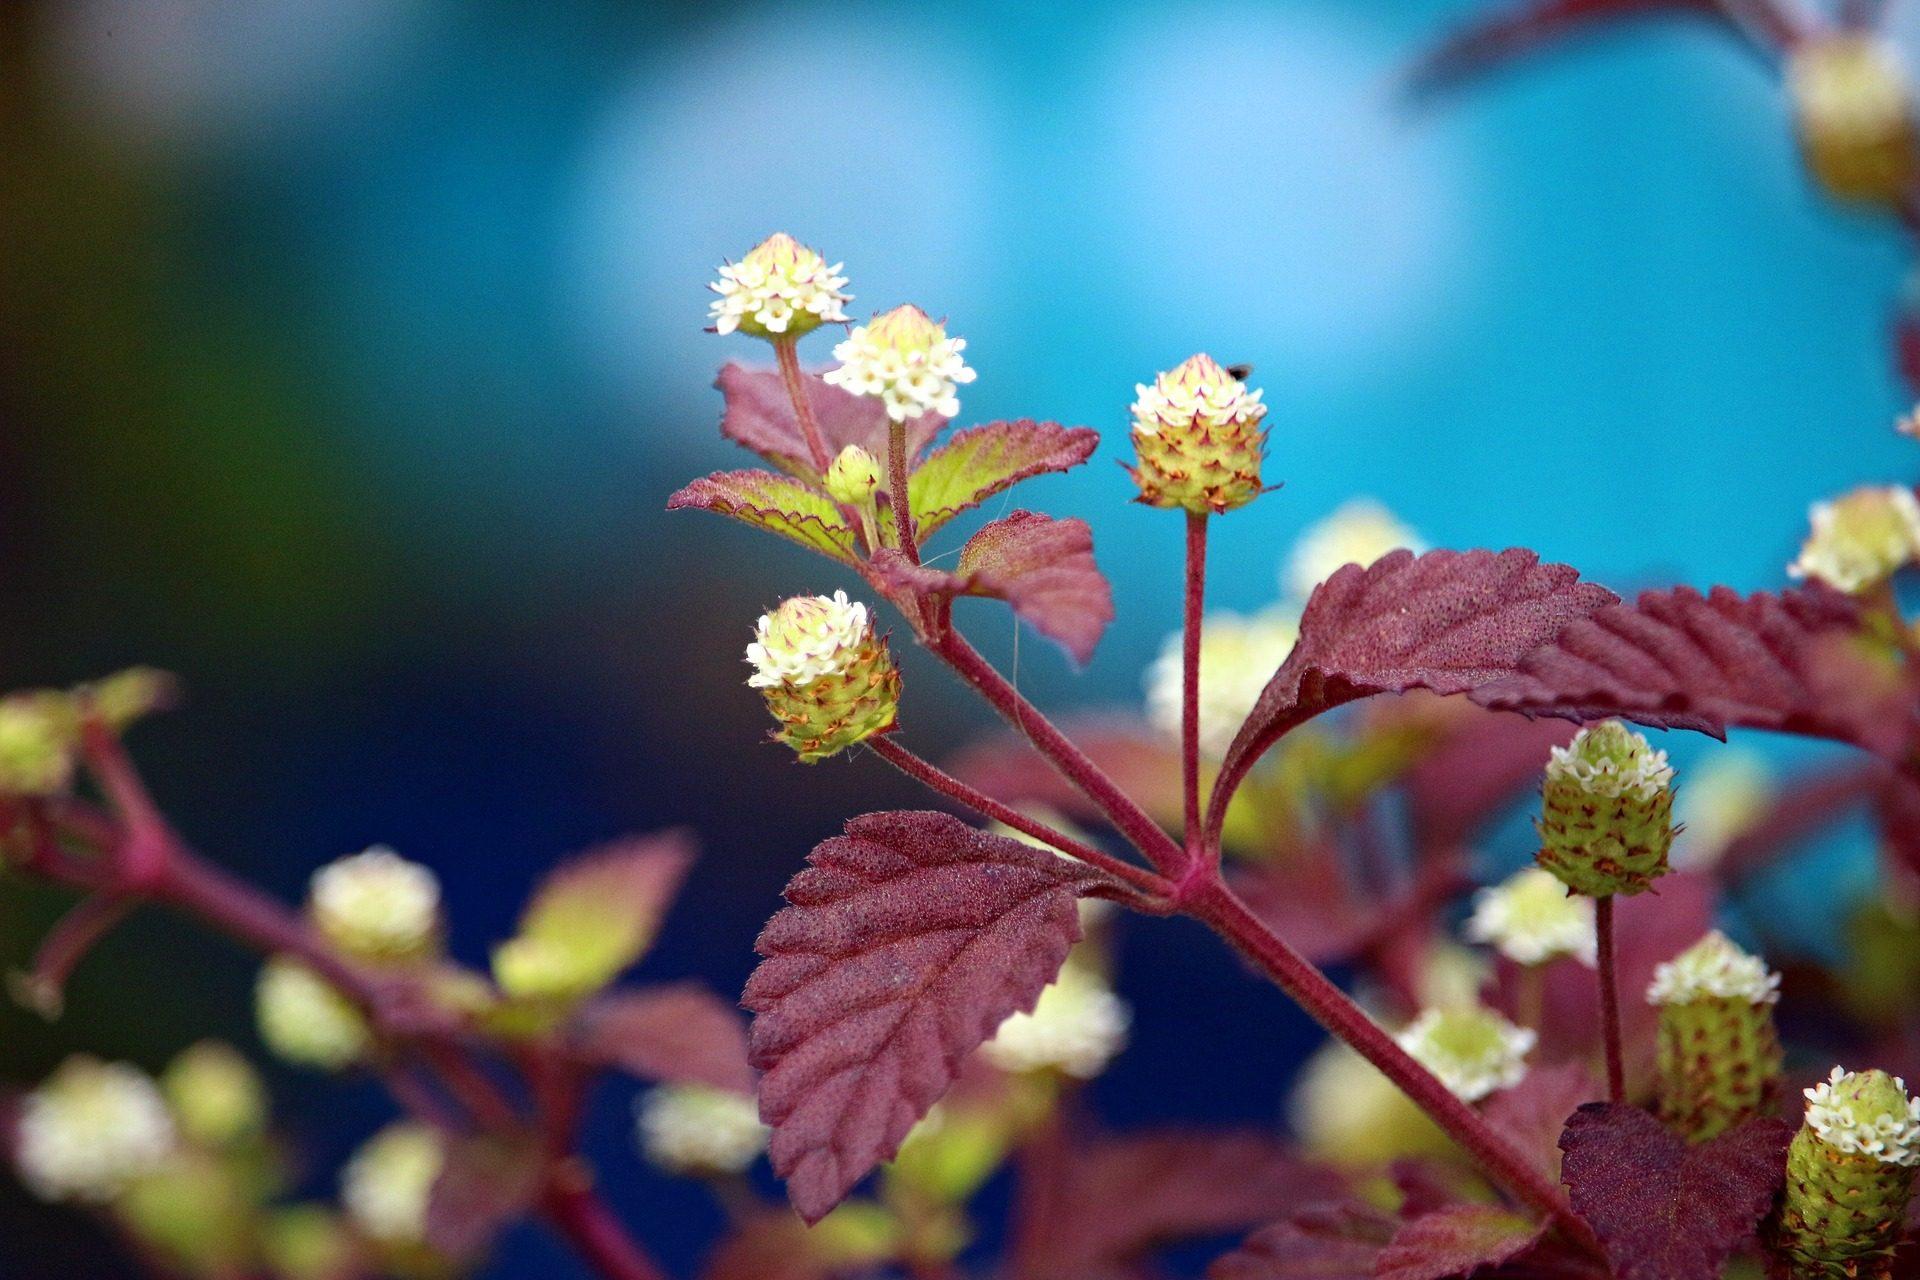 planta, flor, repollo dulce, medicinal, azteca - Fondos de Pantalla HD - professor-falken.com